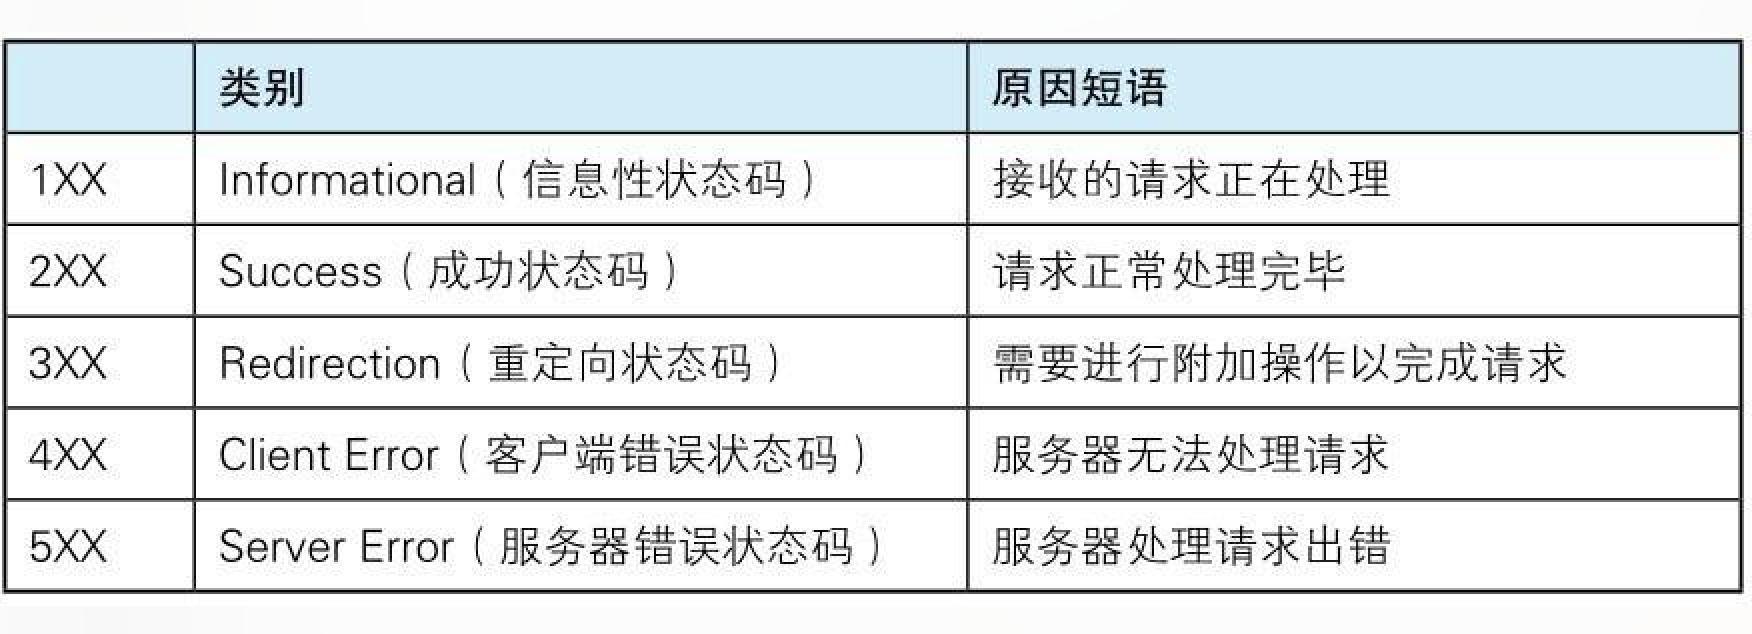 HTTP return status code, and 14 common status codes